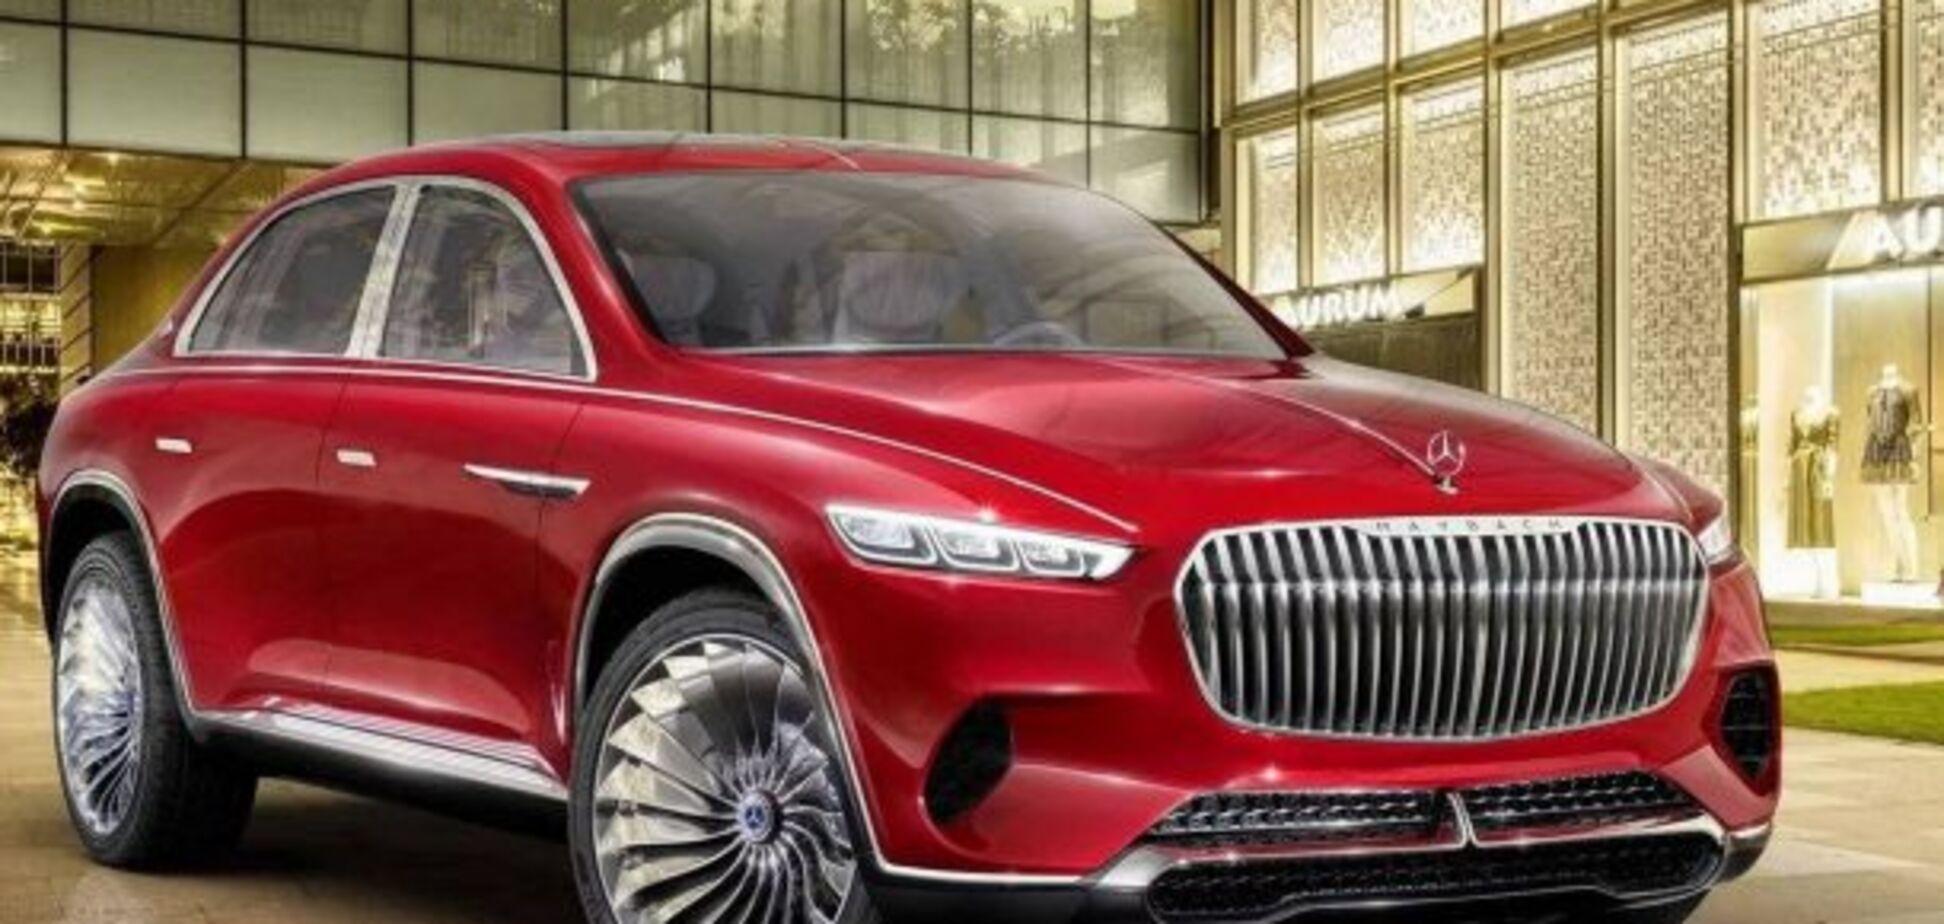 Maybach для Китая: Mercedes-Benz удивил концептом кроссовера